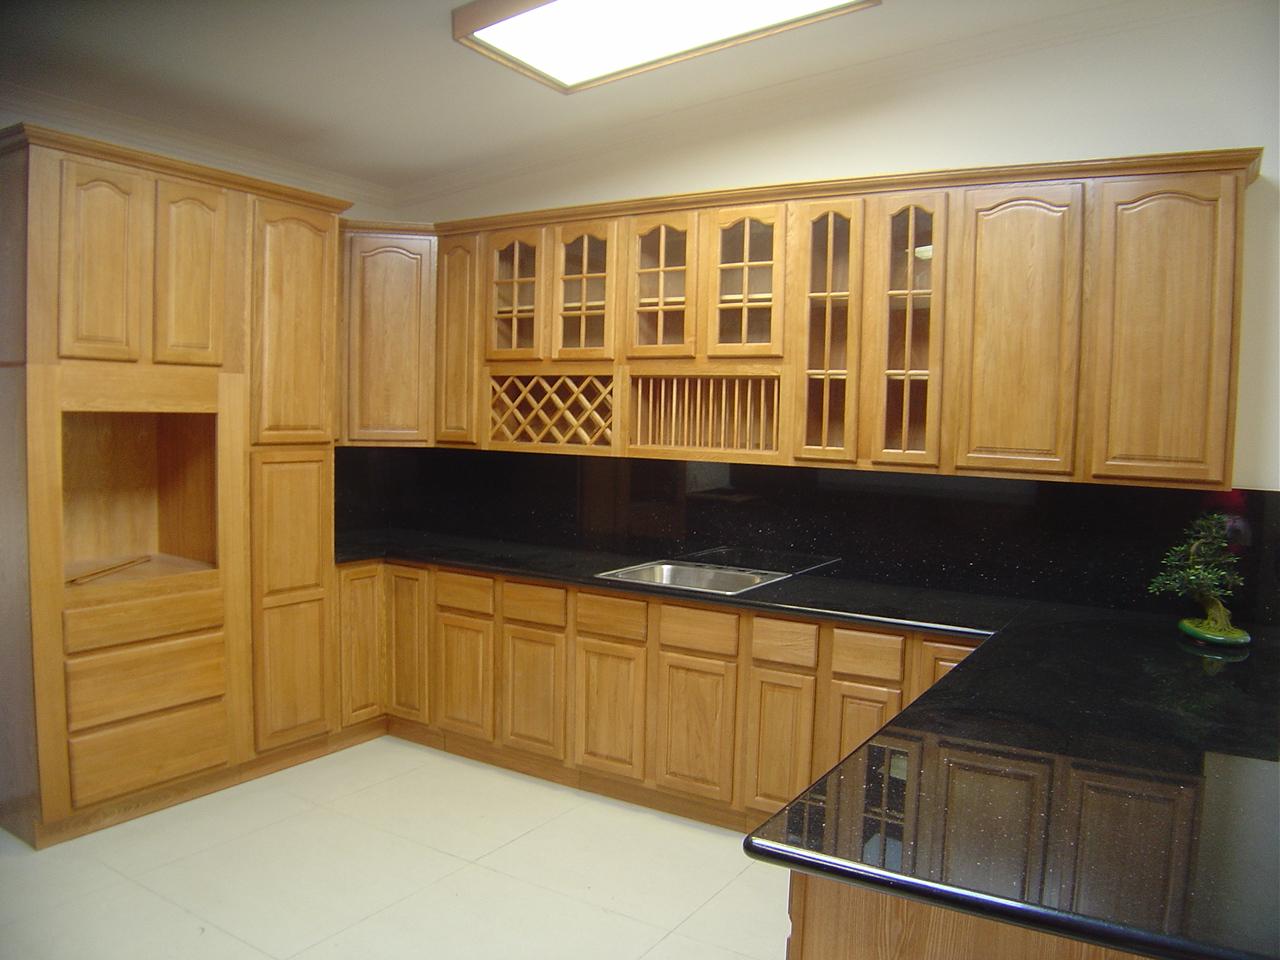 Fascinating Kitchen Design Natural Oak Kitchen Cabinet Ideas Black Marble Countertop Viahouse Com